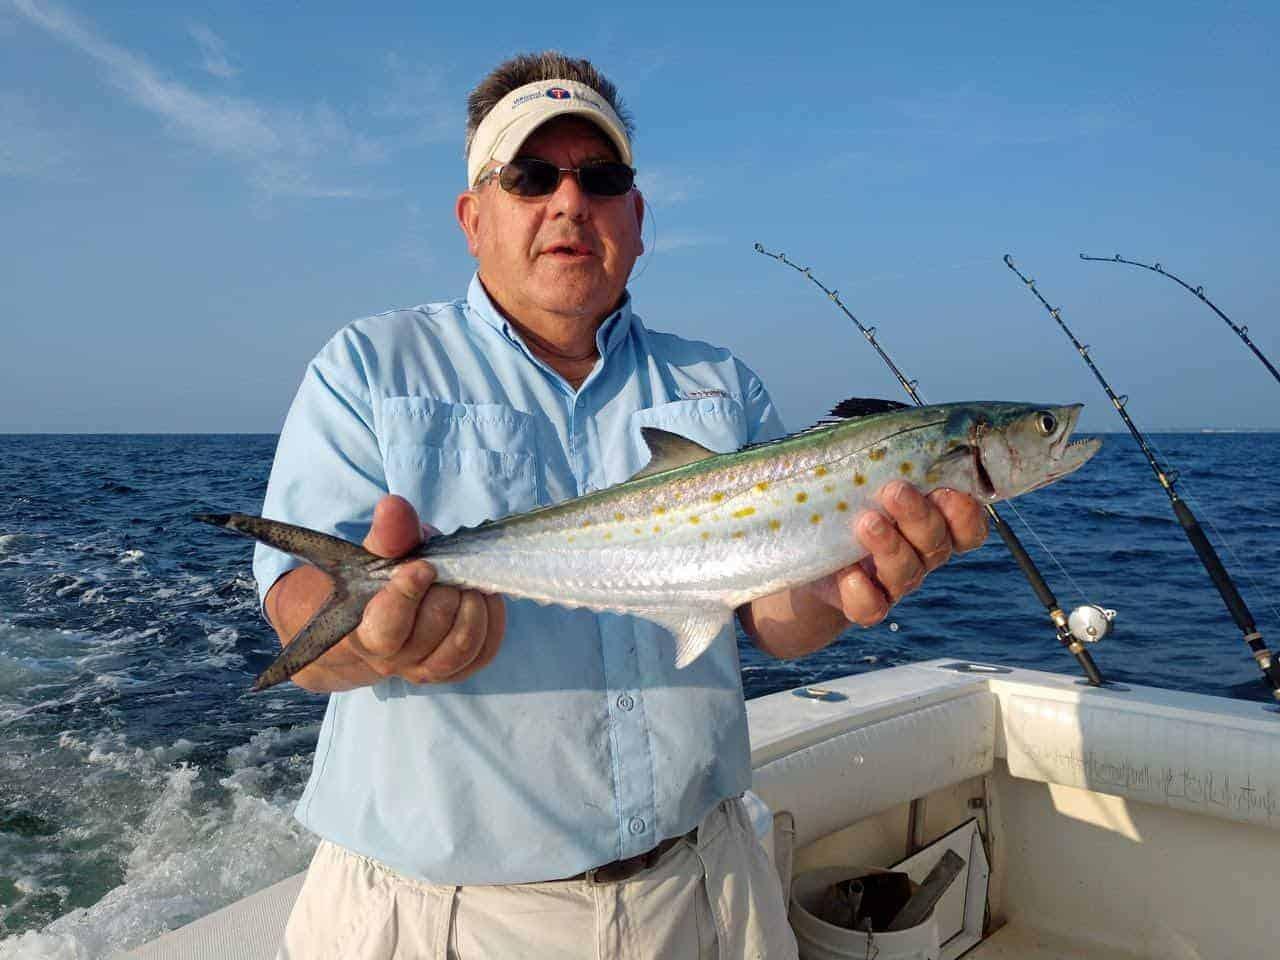 Stan Simmerman of Virginia shows off a nice Spanish mackerel. (Photo courtesy of Ken Neill)